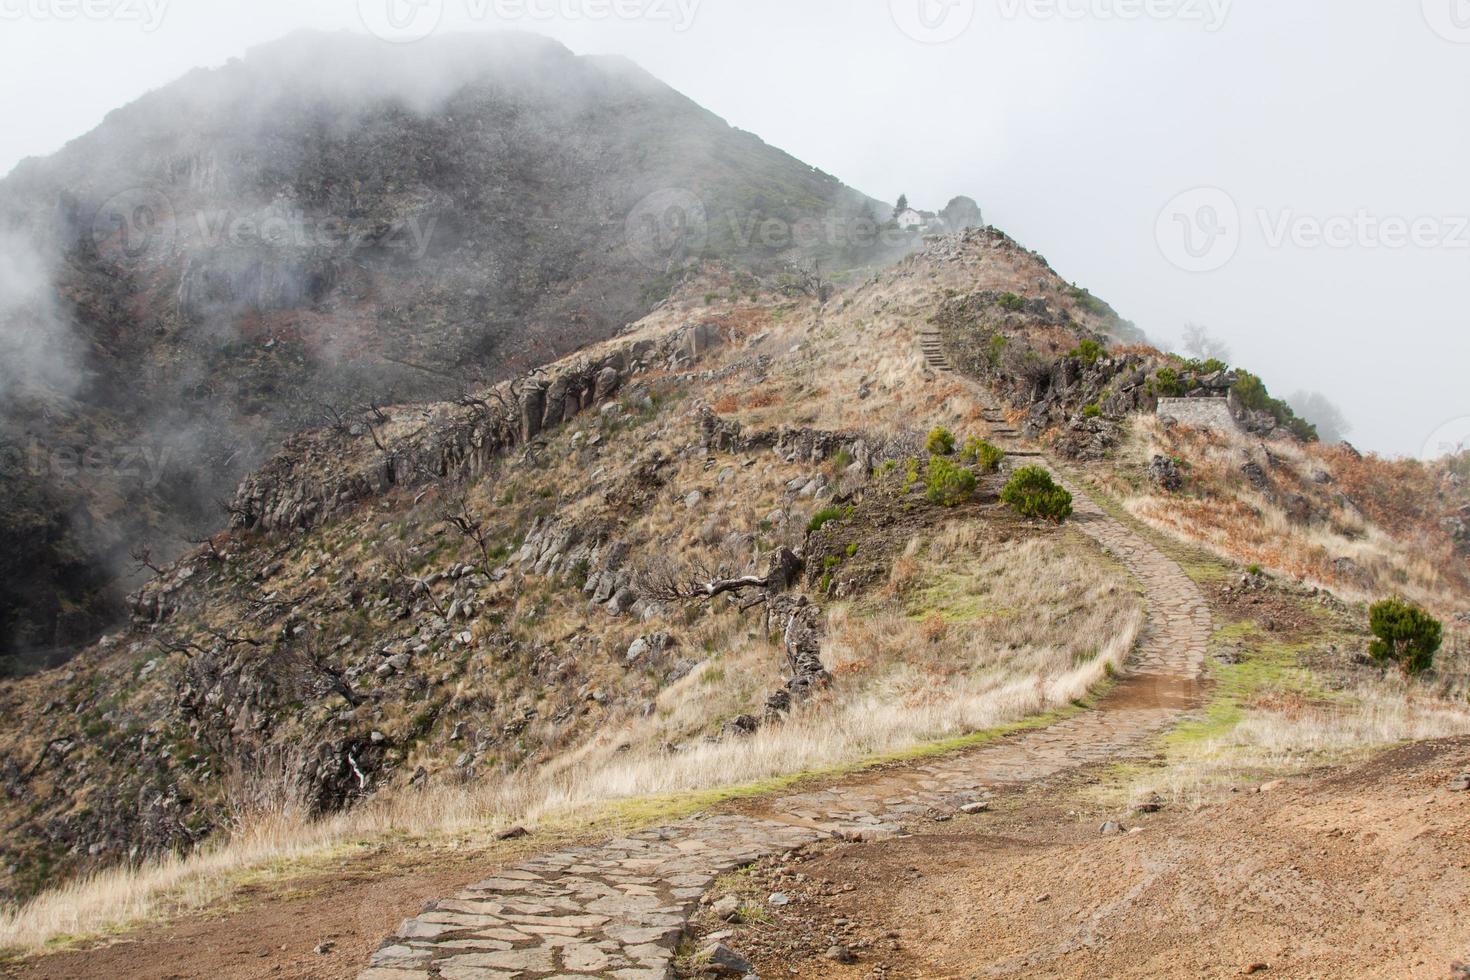 Pico do Arieiro in Madeira Island, Portugal photo